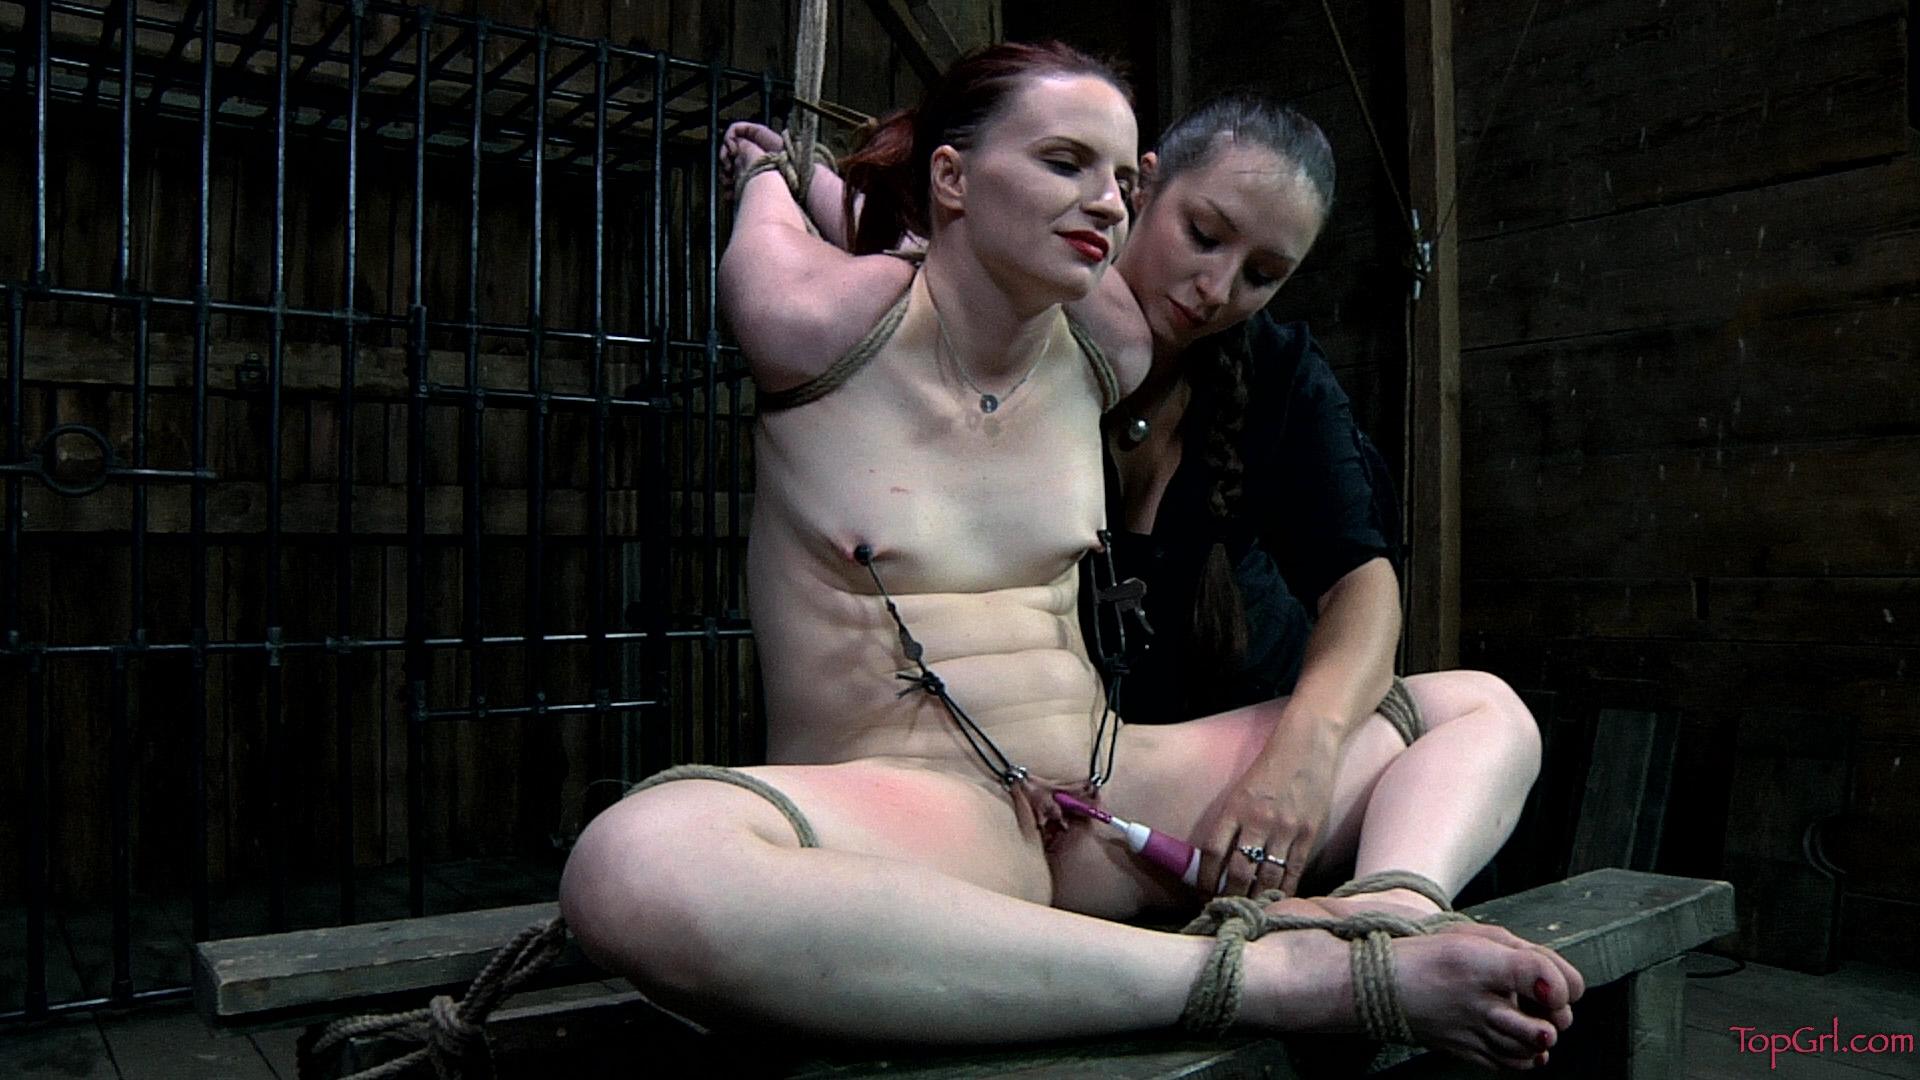 Электро бдсм порно онлайн 1 фотография